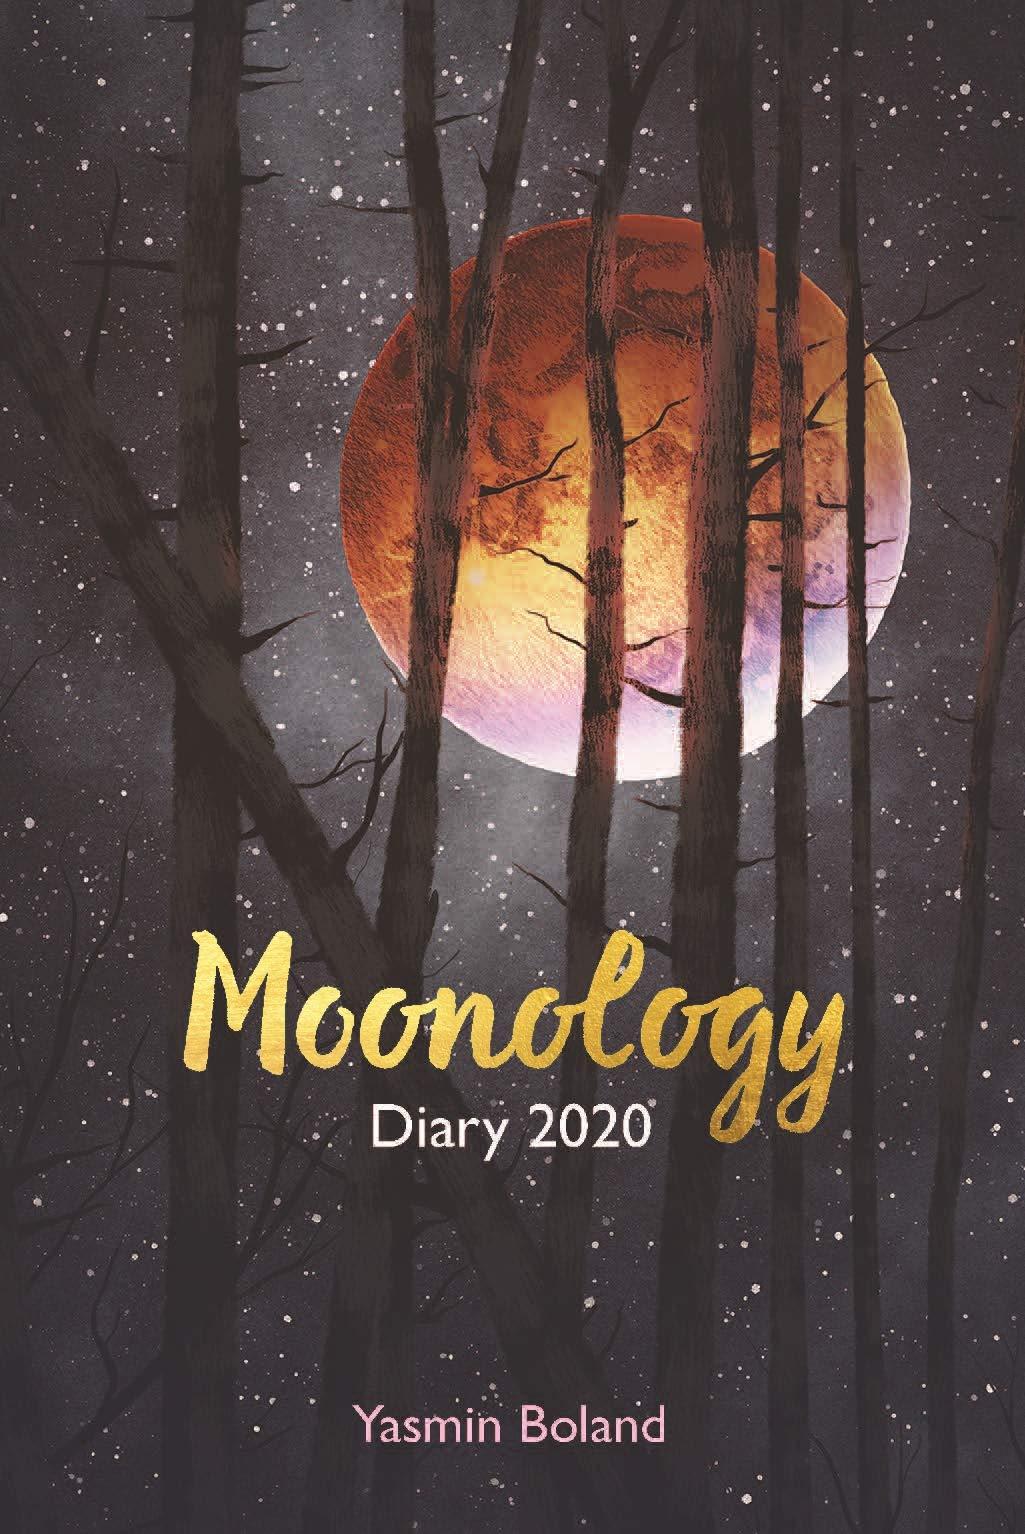 Moonology Diary 2020: Amazon.es: Yasmin Boland: Libros en ...